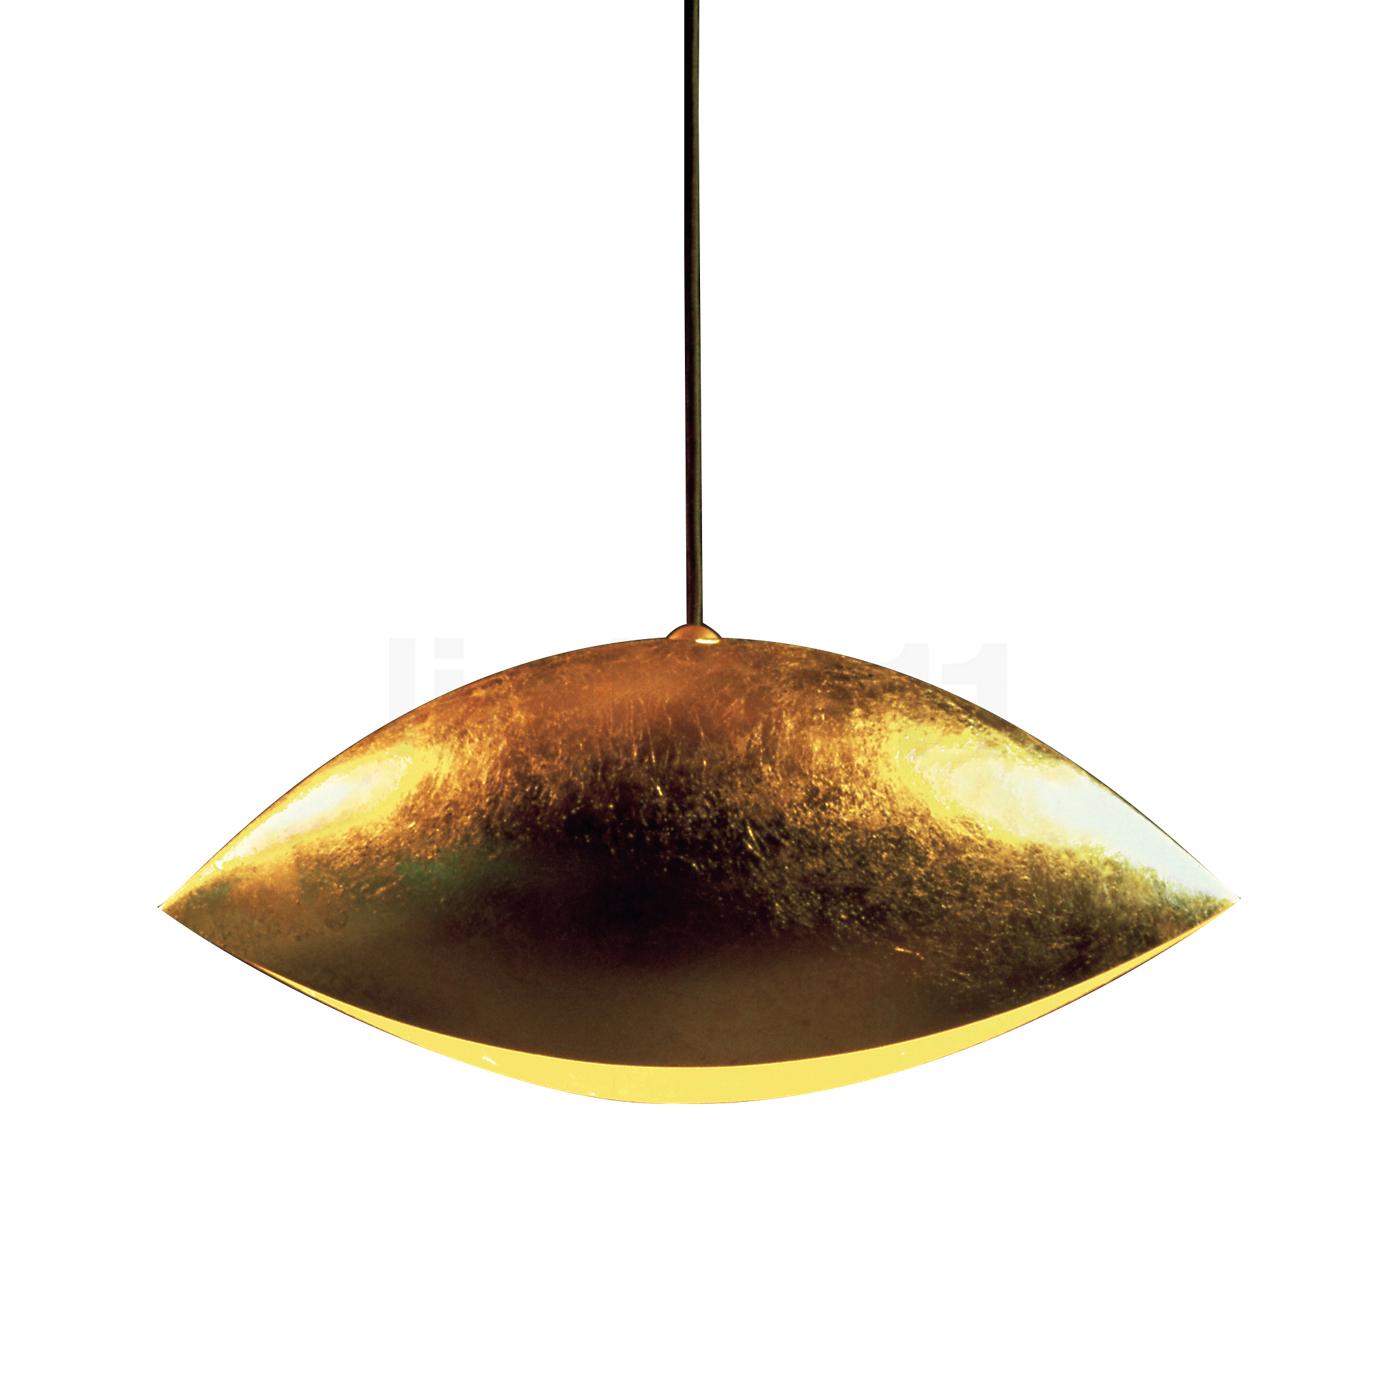 catellani smith malagola eettafellamp kopen op. Black Bedroom Furniture Sets. Home Design Ideas